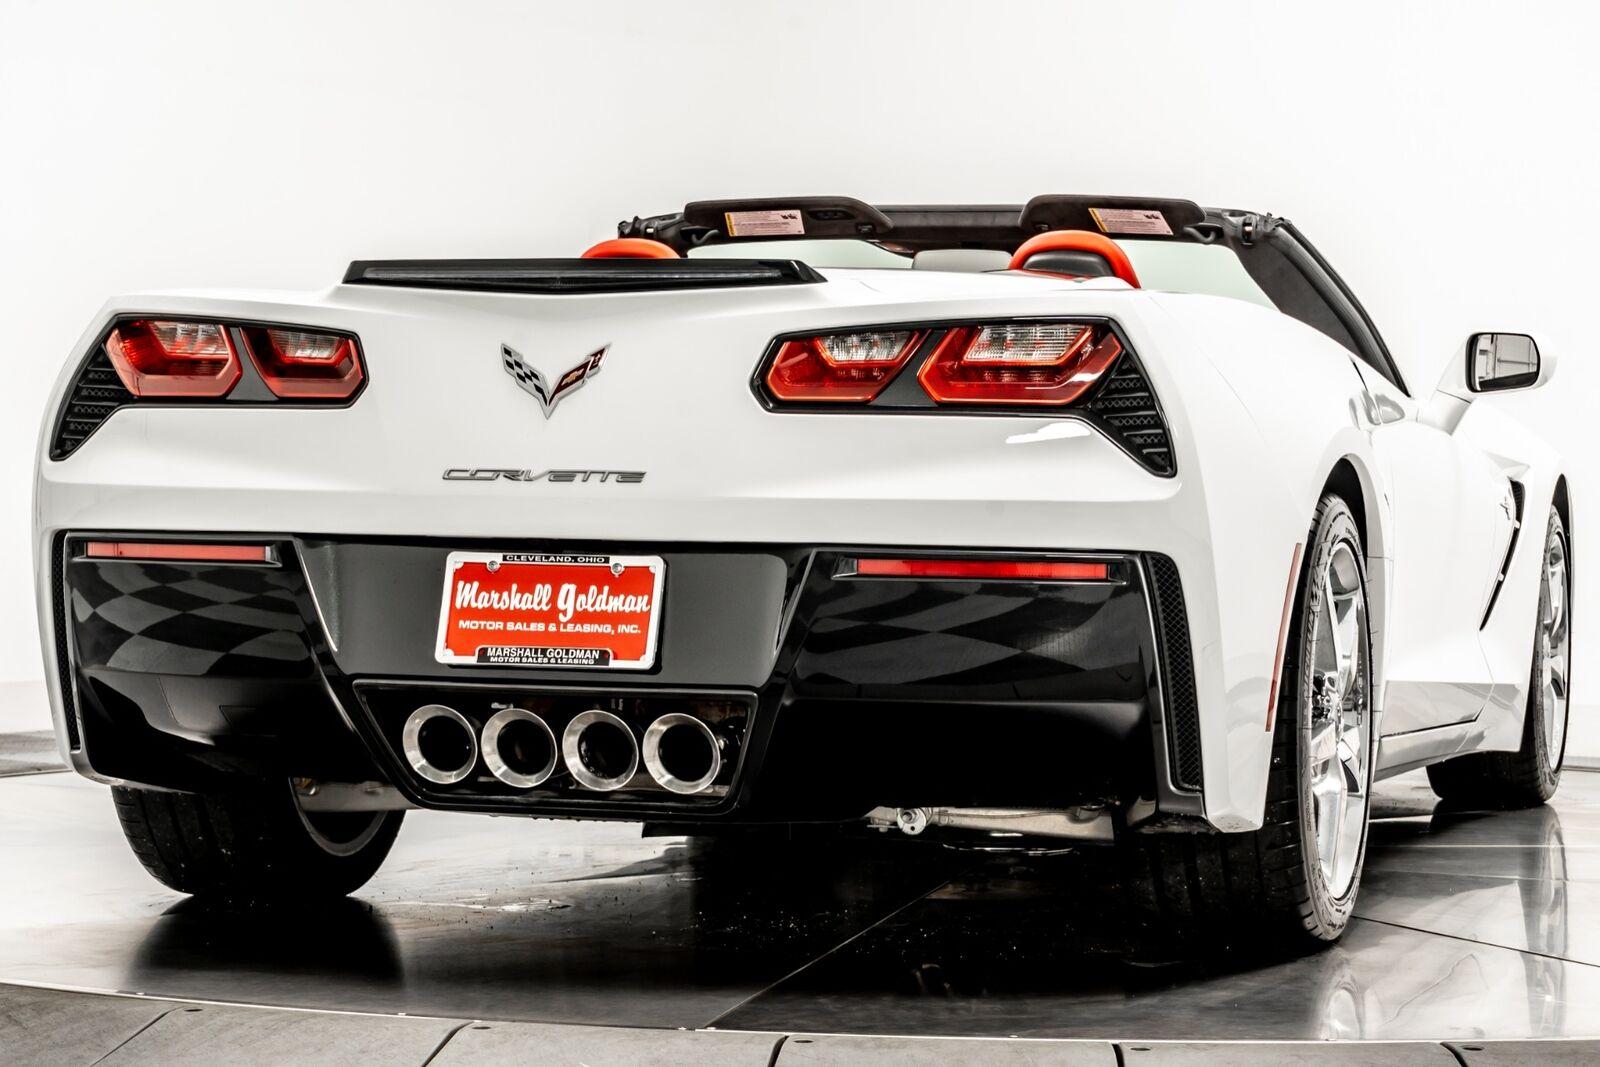 2015 White Chevrolet Corvette Convertible 3LT   C7 Corvette Photo 8